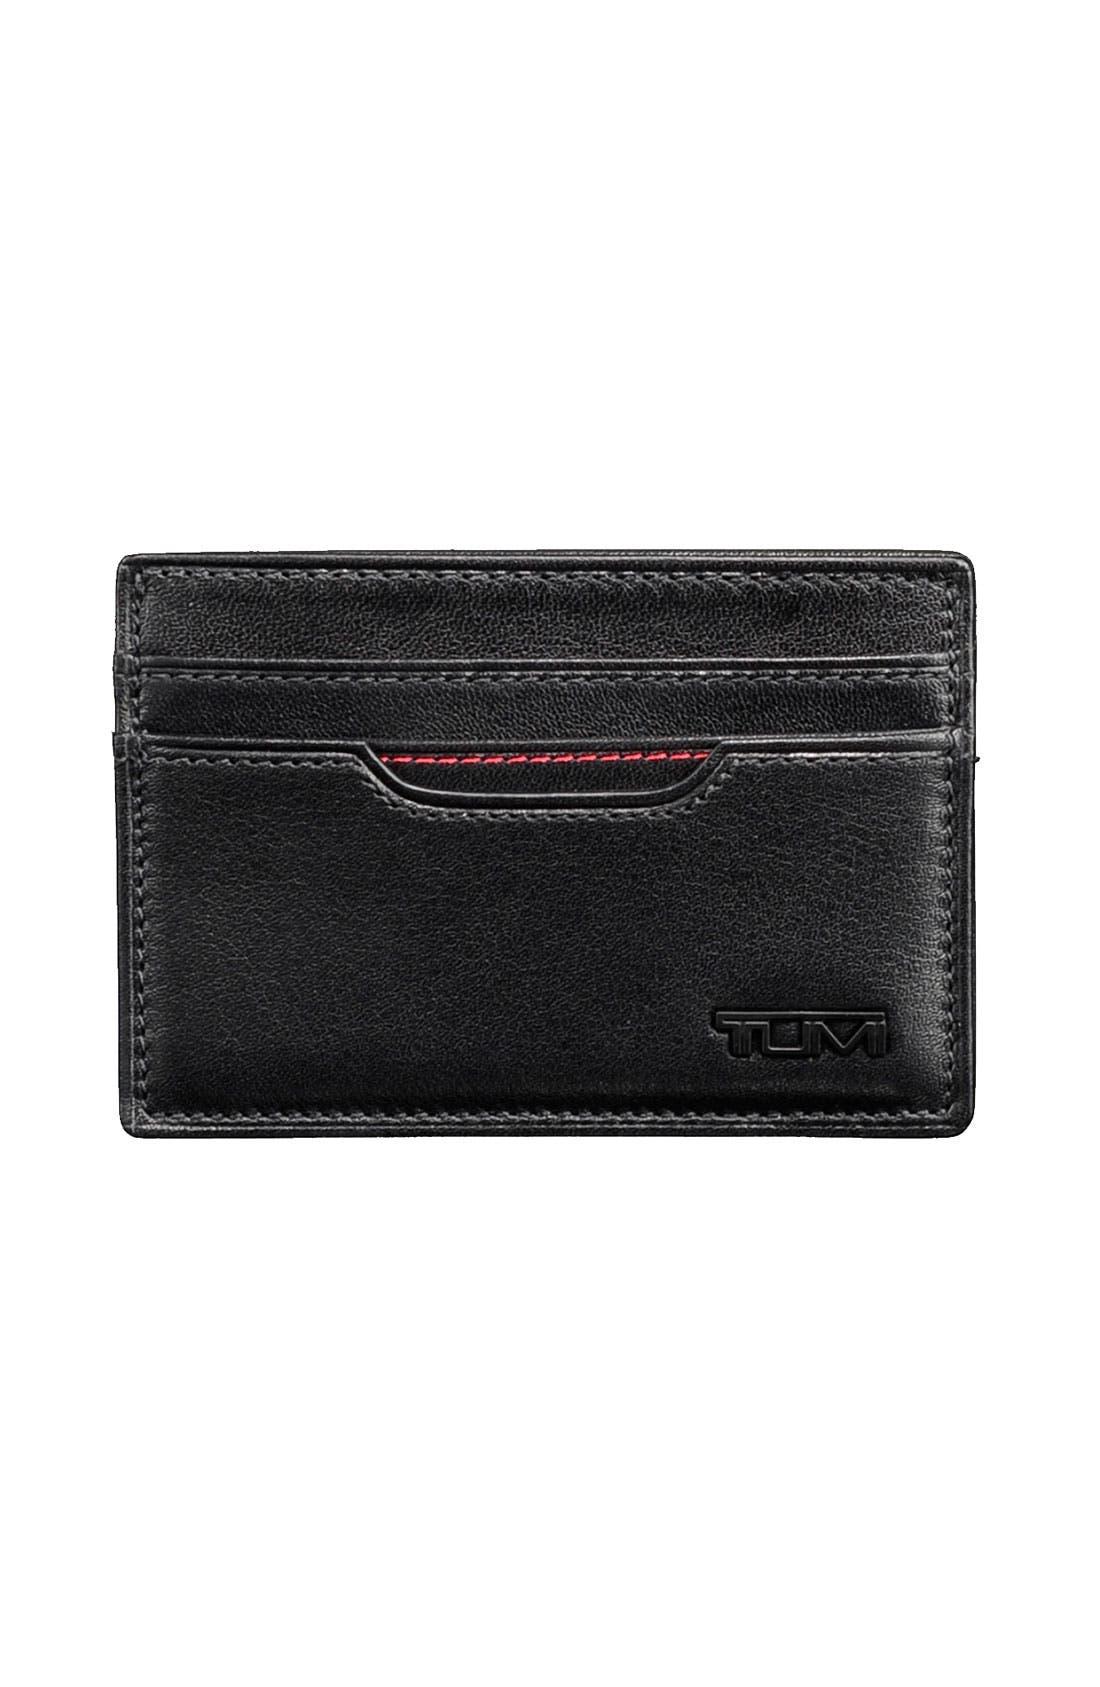 Main Image - Tumi 'Delta' Slim Card Case ID Wallet